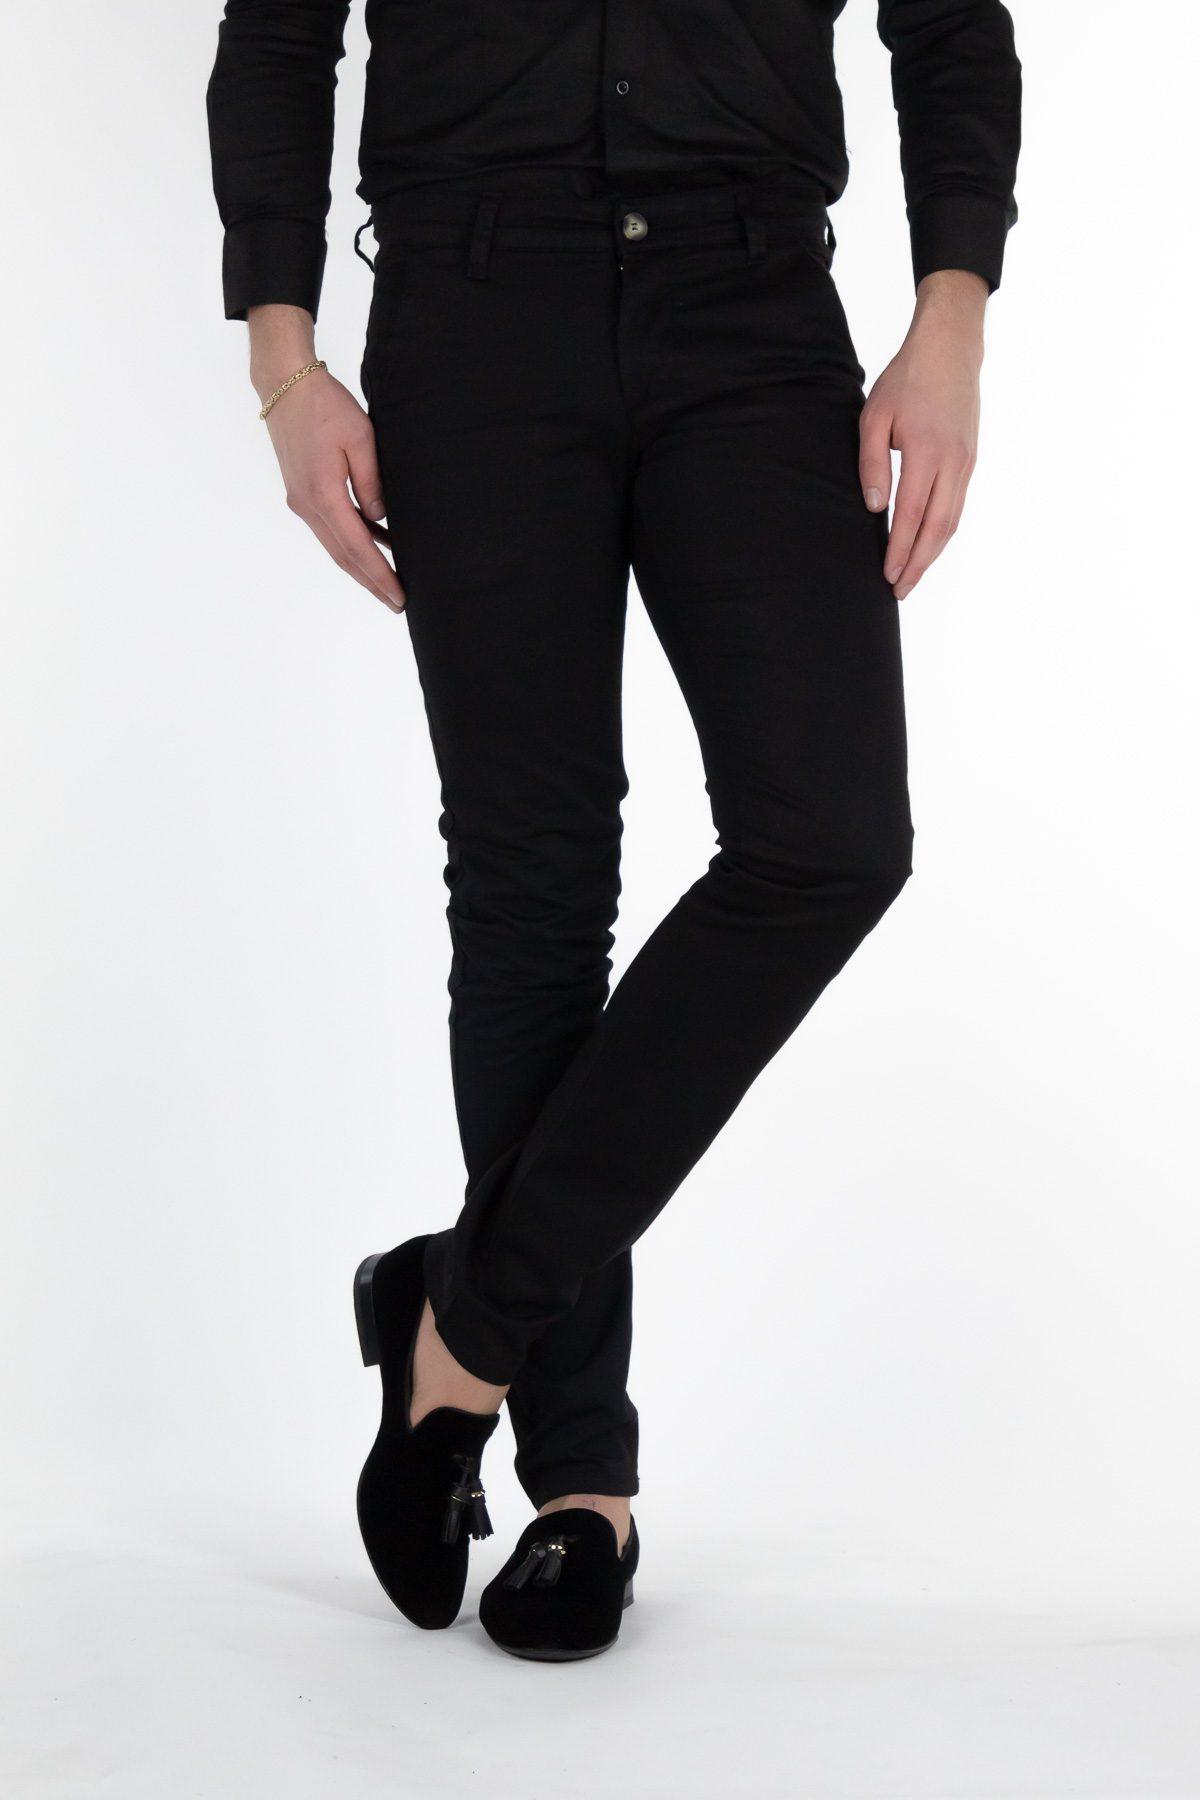 Richesse Marbella Black Pantalon 2236-1